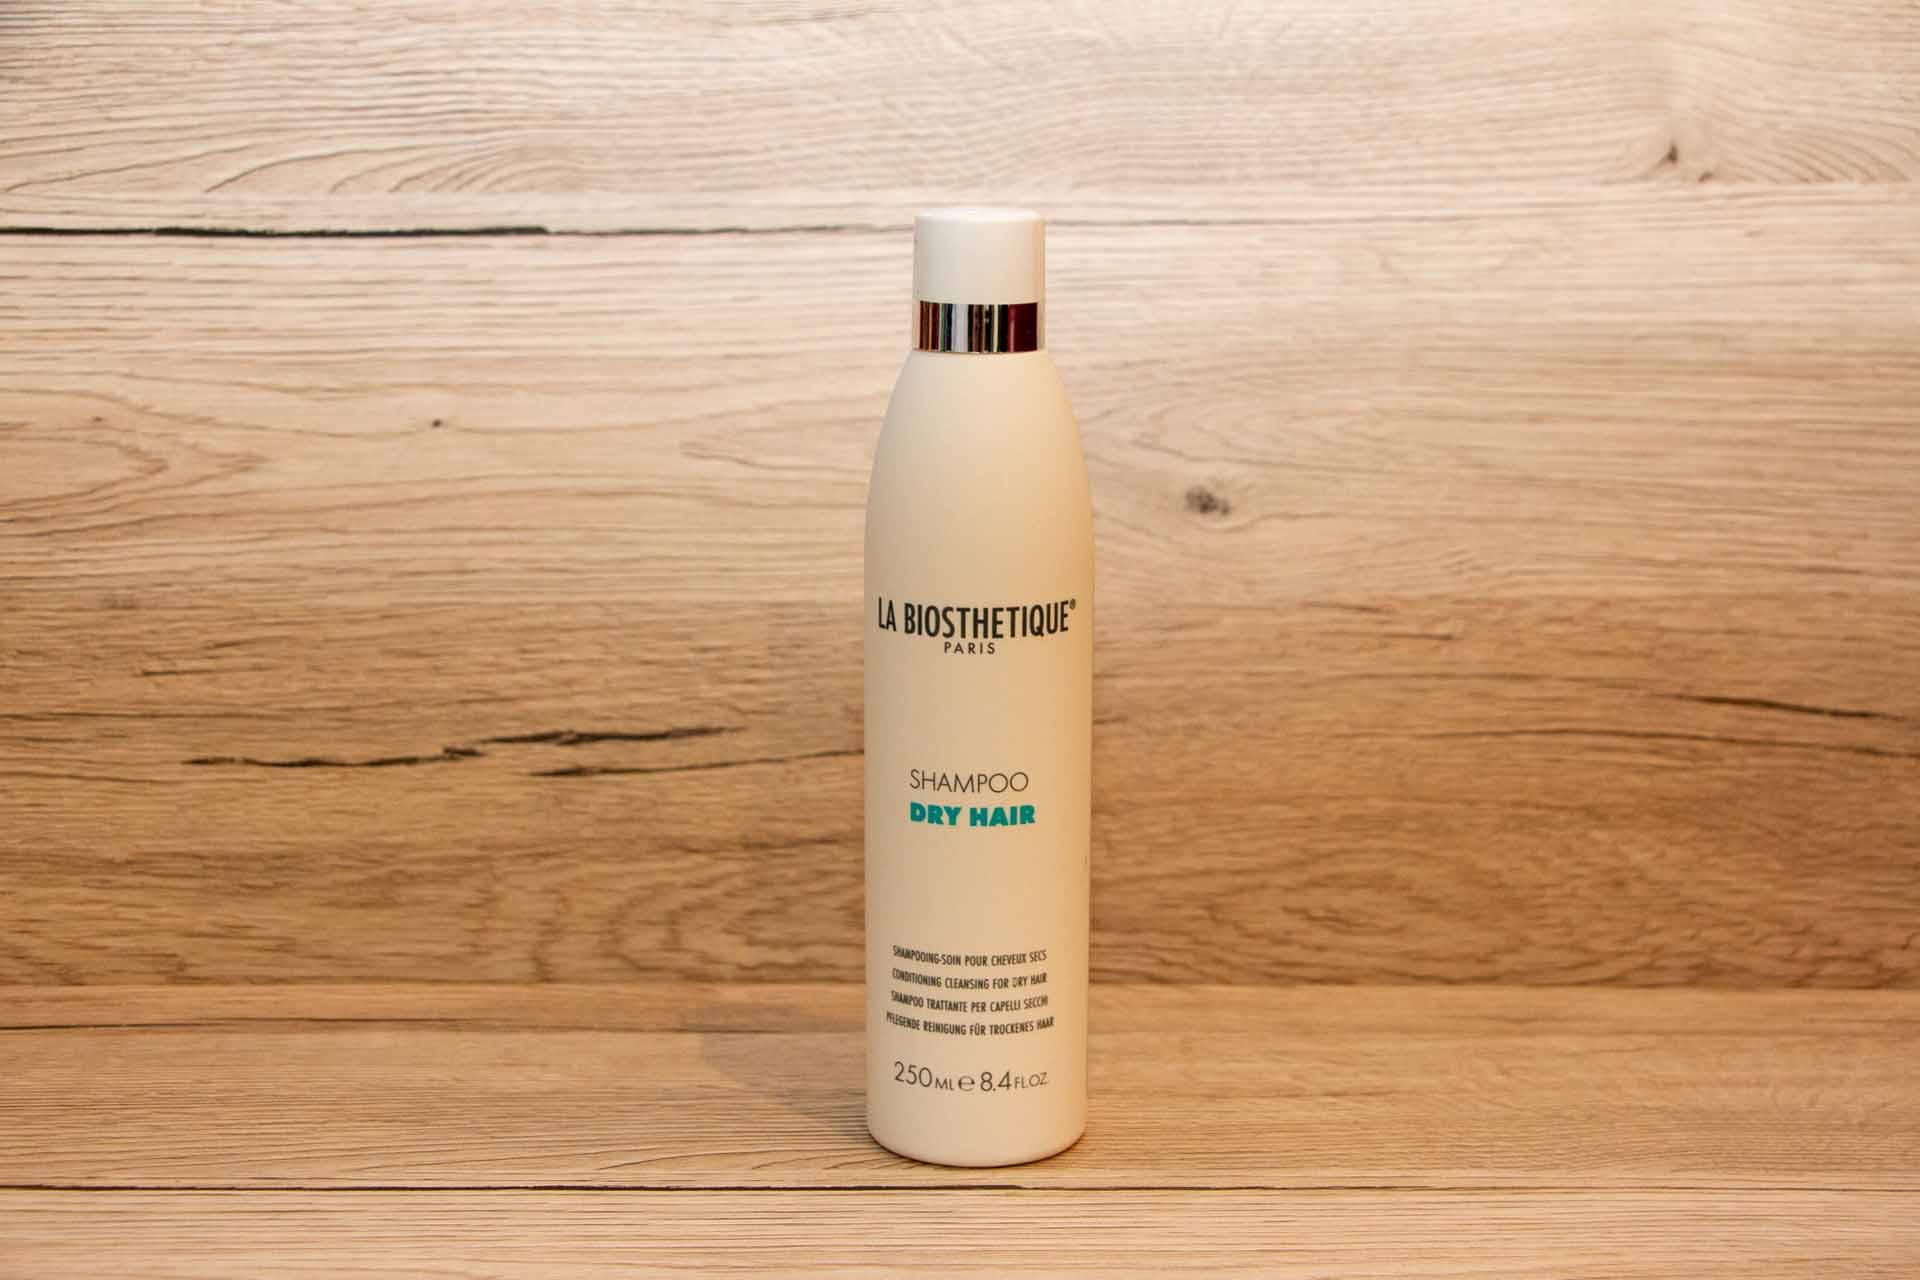 Prodotti La Biosthetique, Shampoo Dry Hair, Diego Staff Parrucchieri Spinea